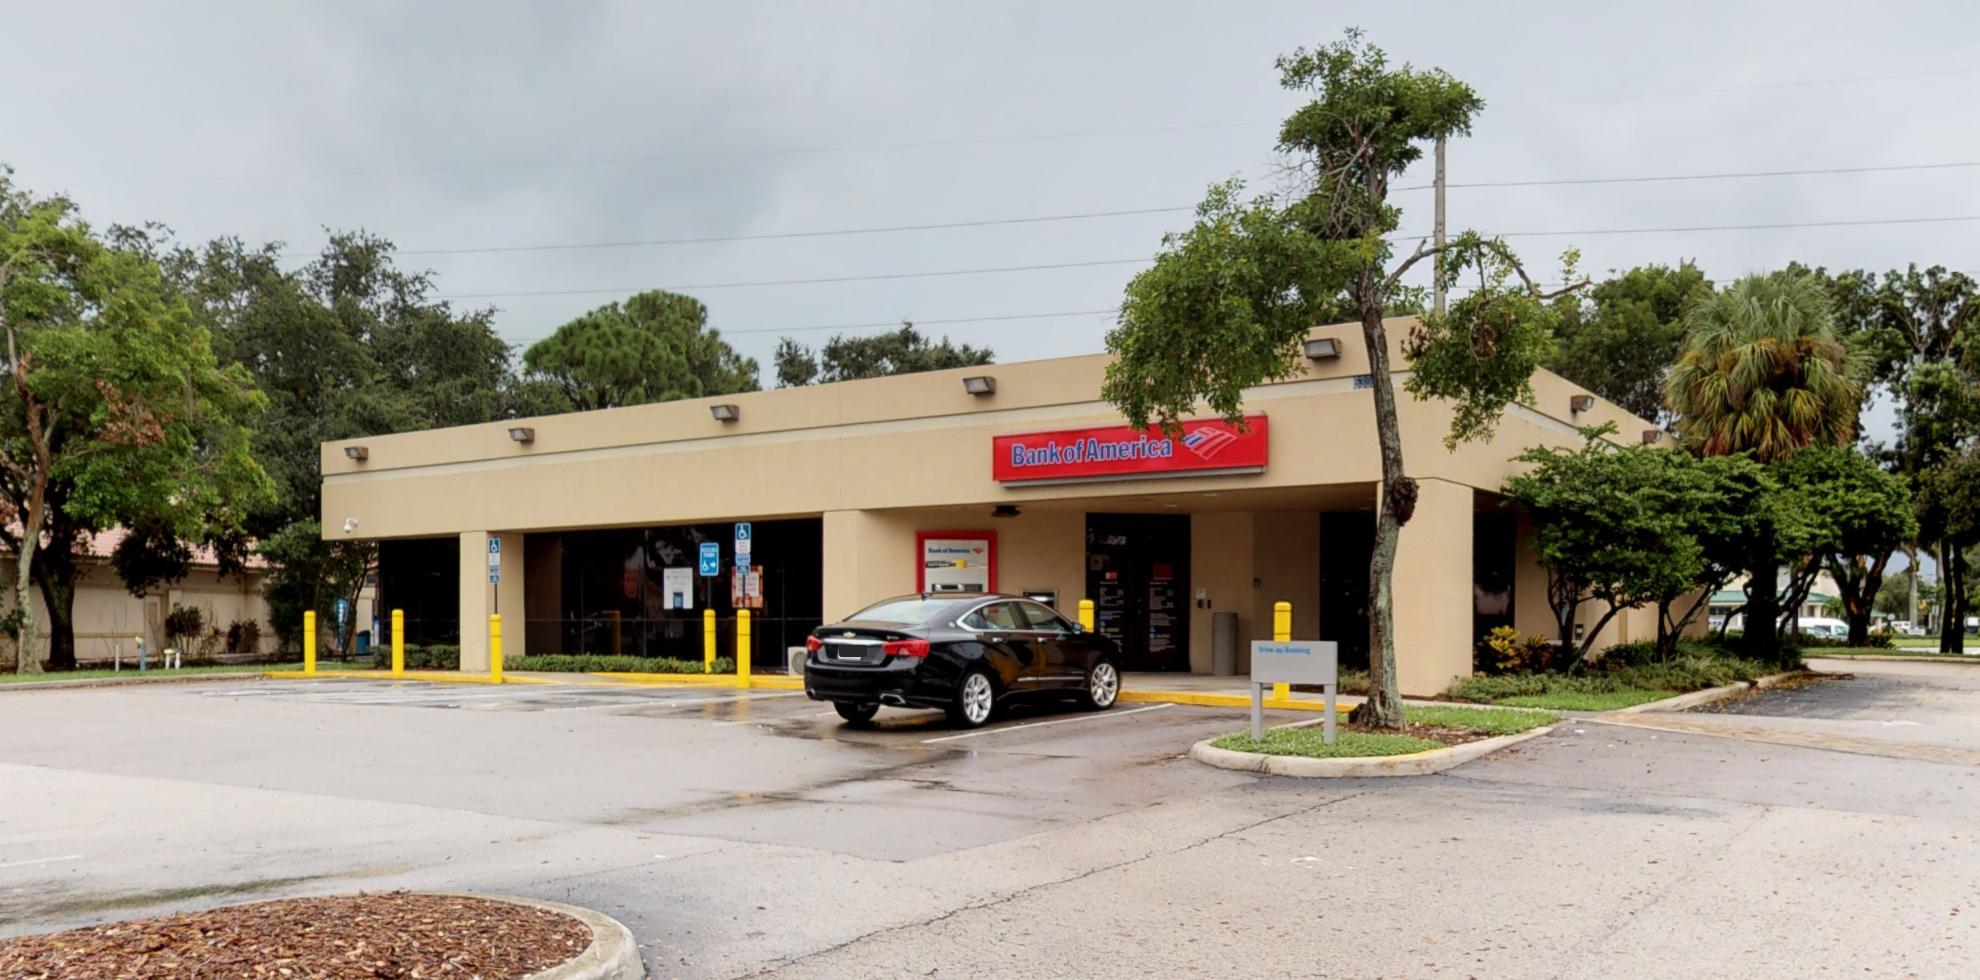 Bank of America financial center with drive-thru ATM | 6360 Lantana Rd, Lake Worth, FL 33463